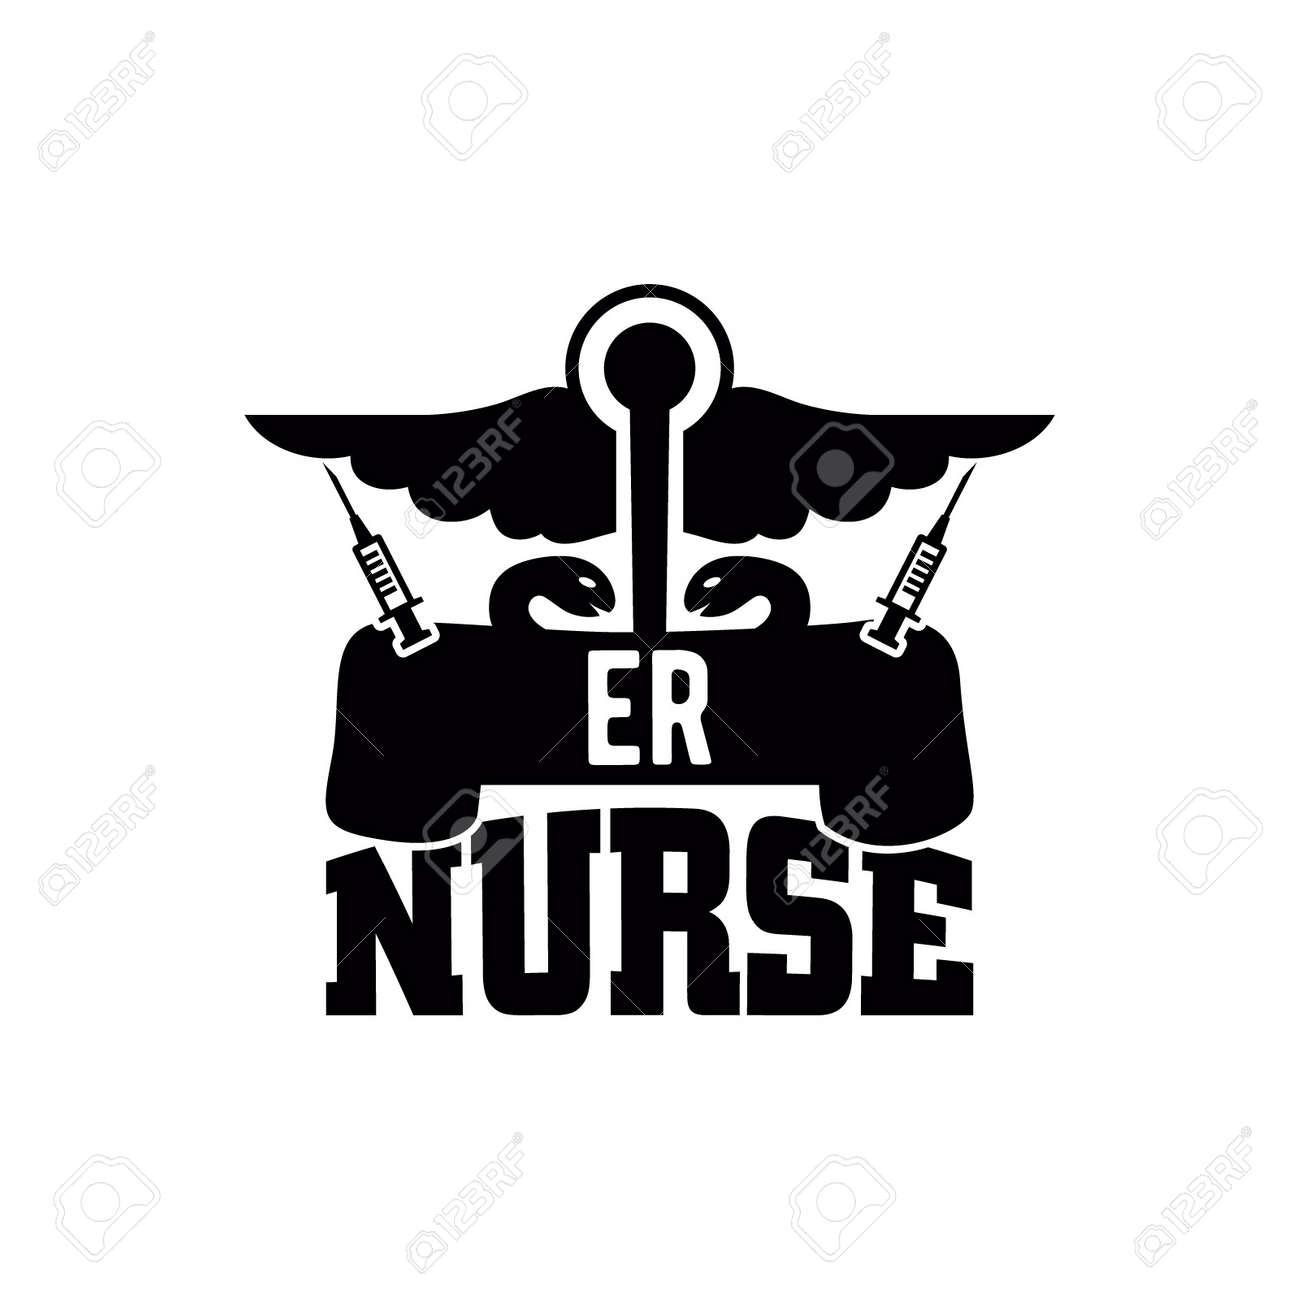 er nurse, awesome nurse design, family nurse saying, motivational and inspirational quotes, vector illustration - 173411719